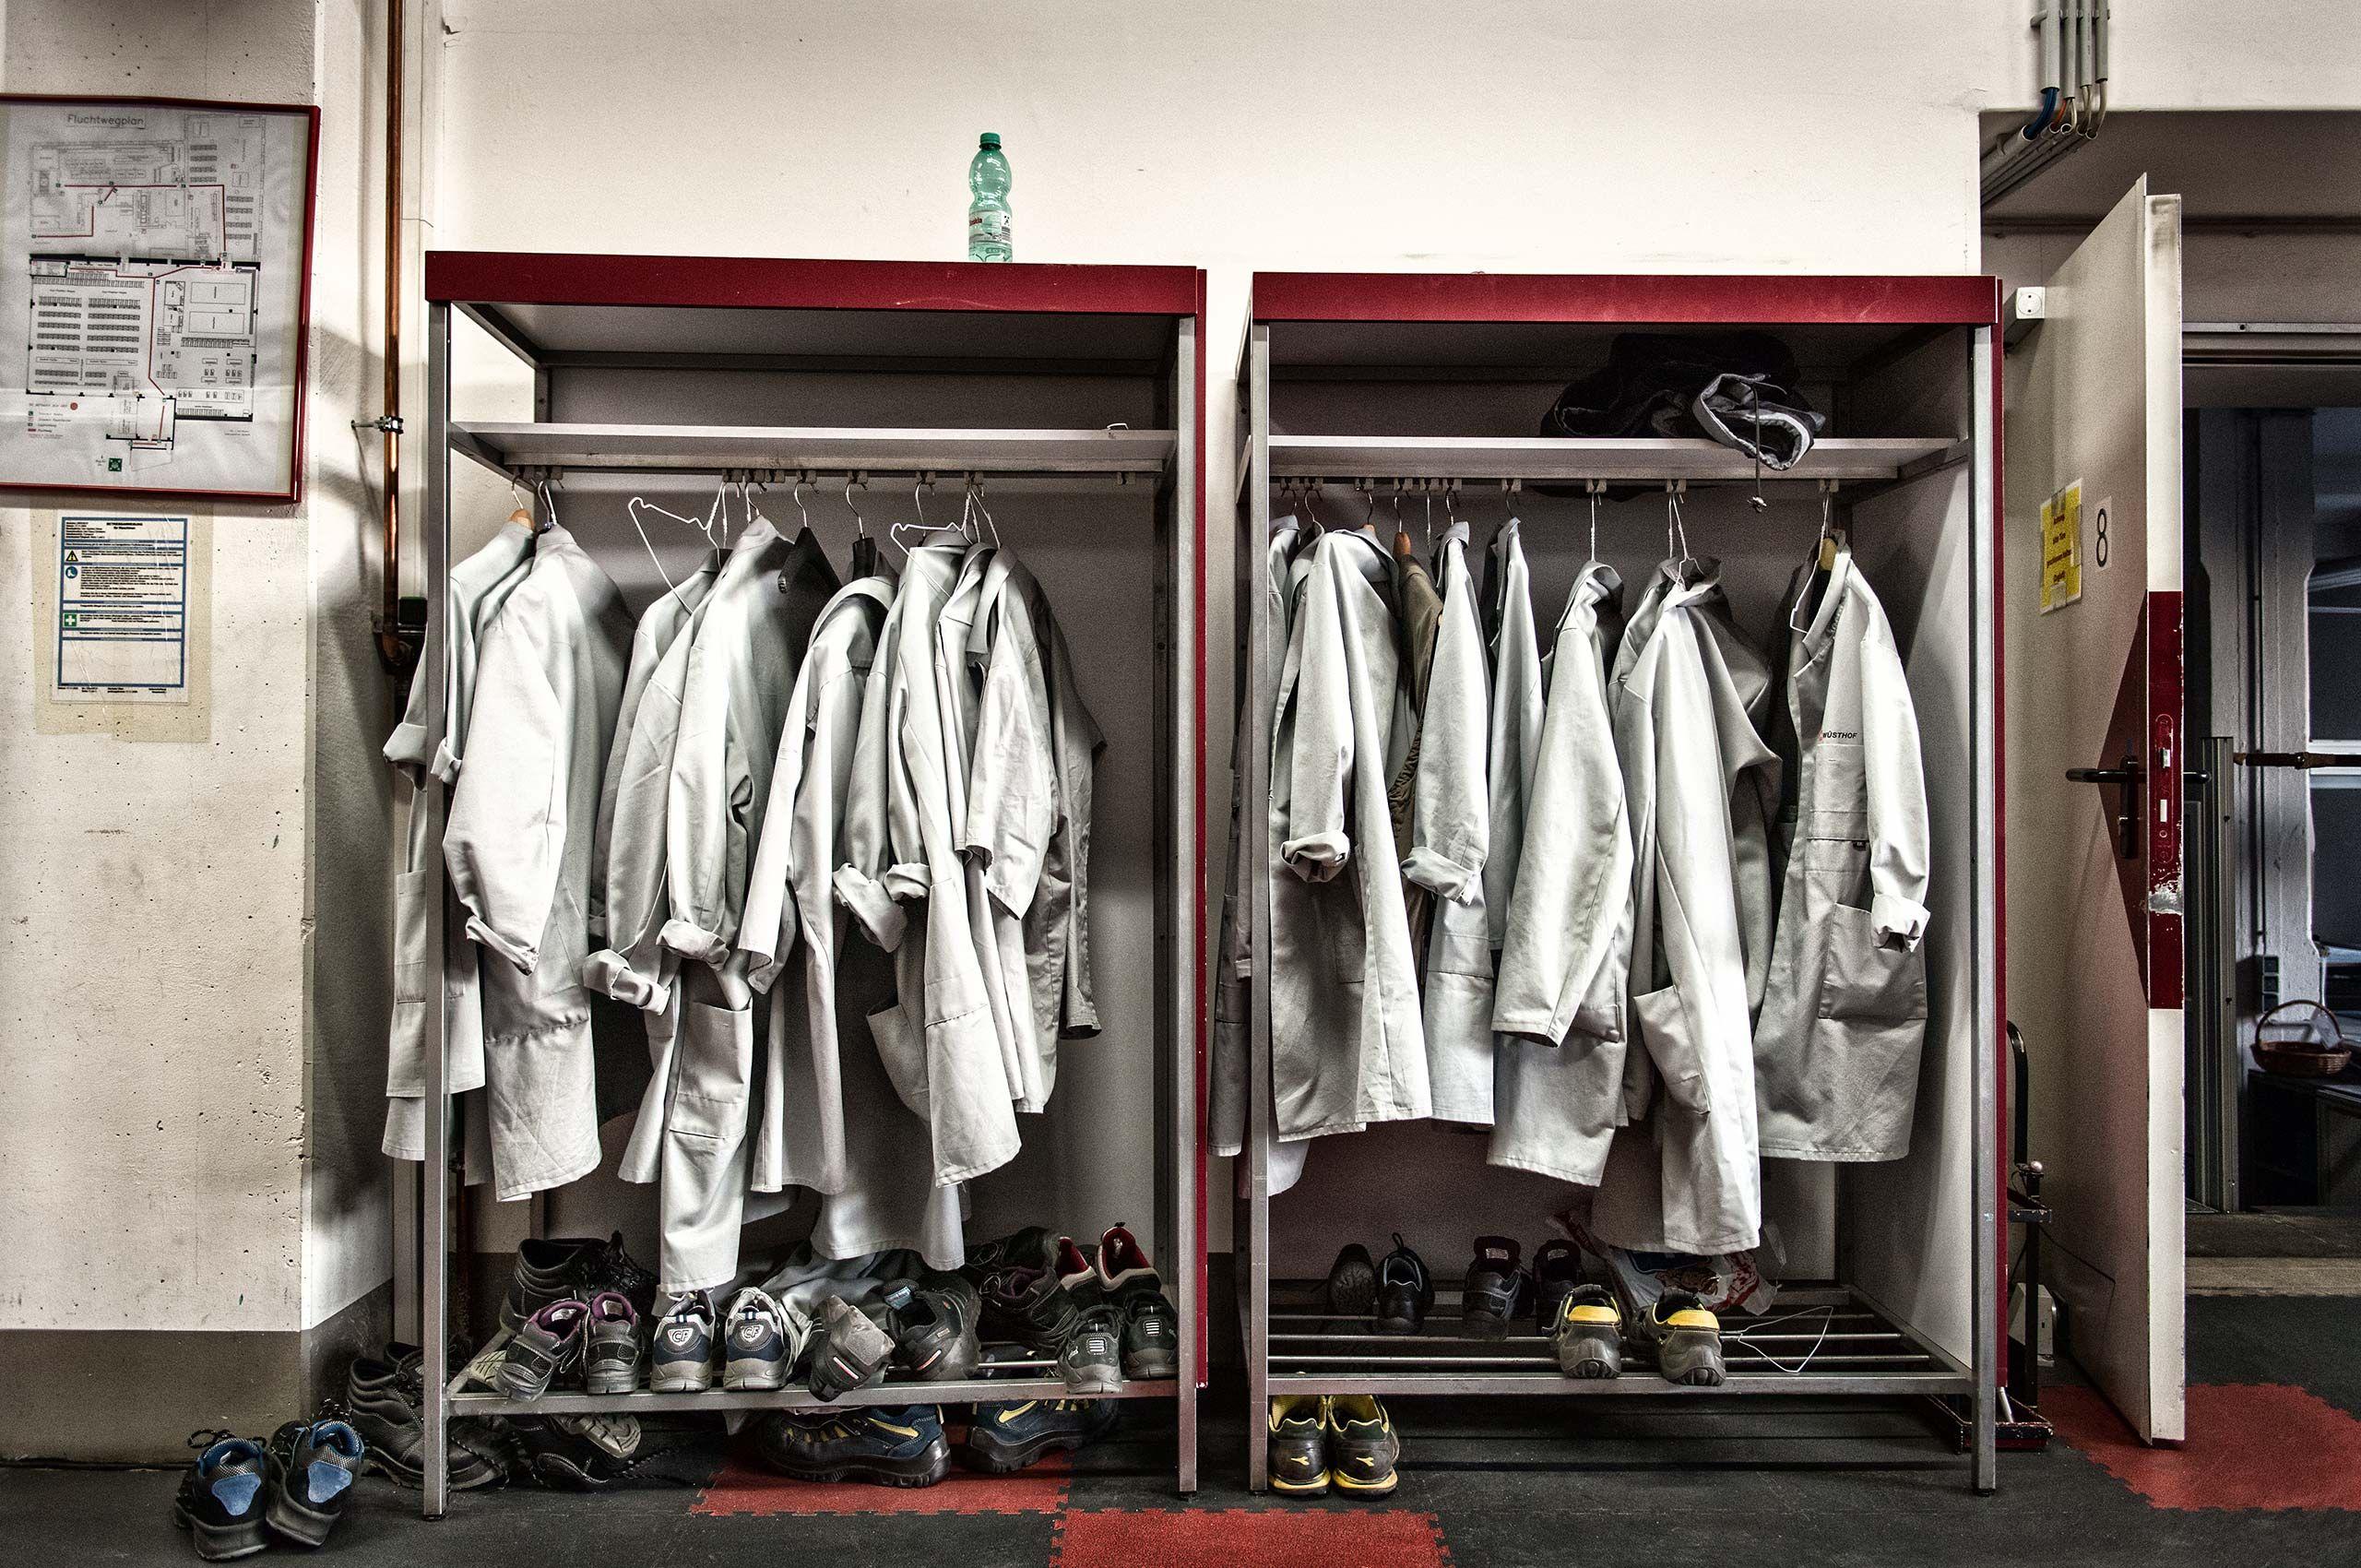 work-uniforms-wusthof-factory-HenrikOlundPhotography.jpg